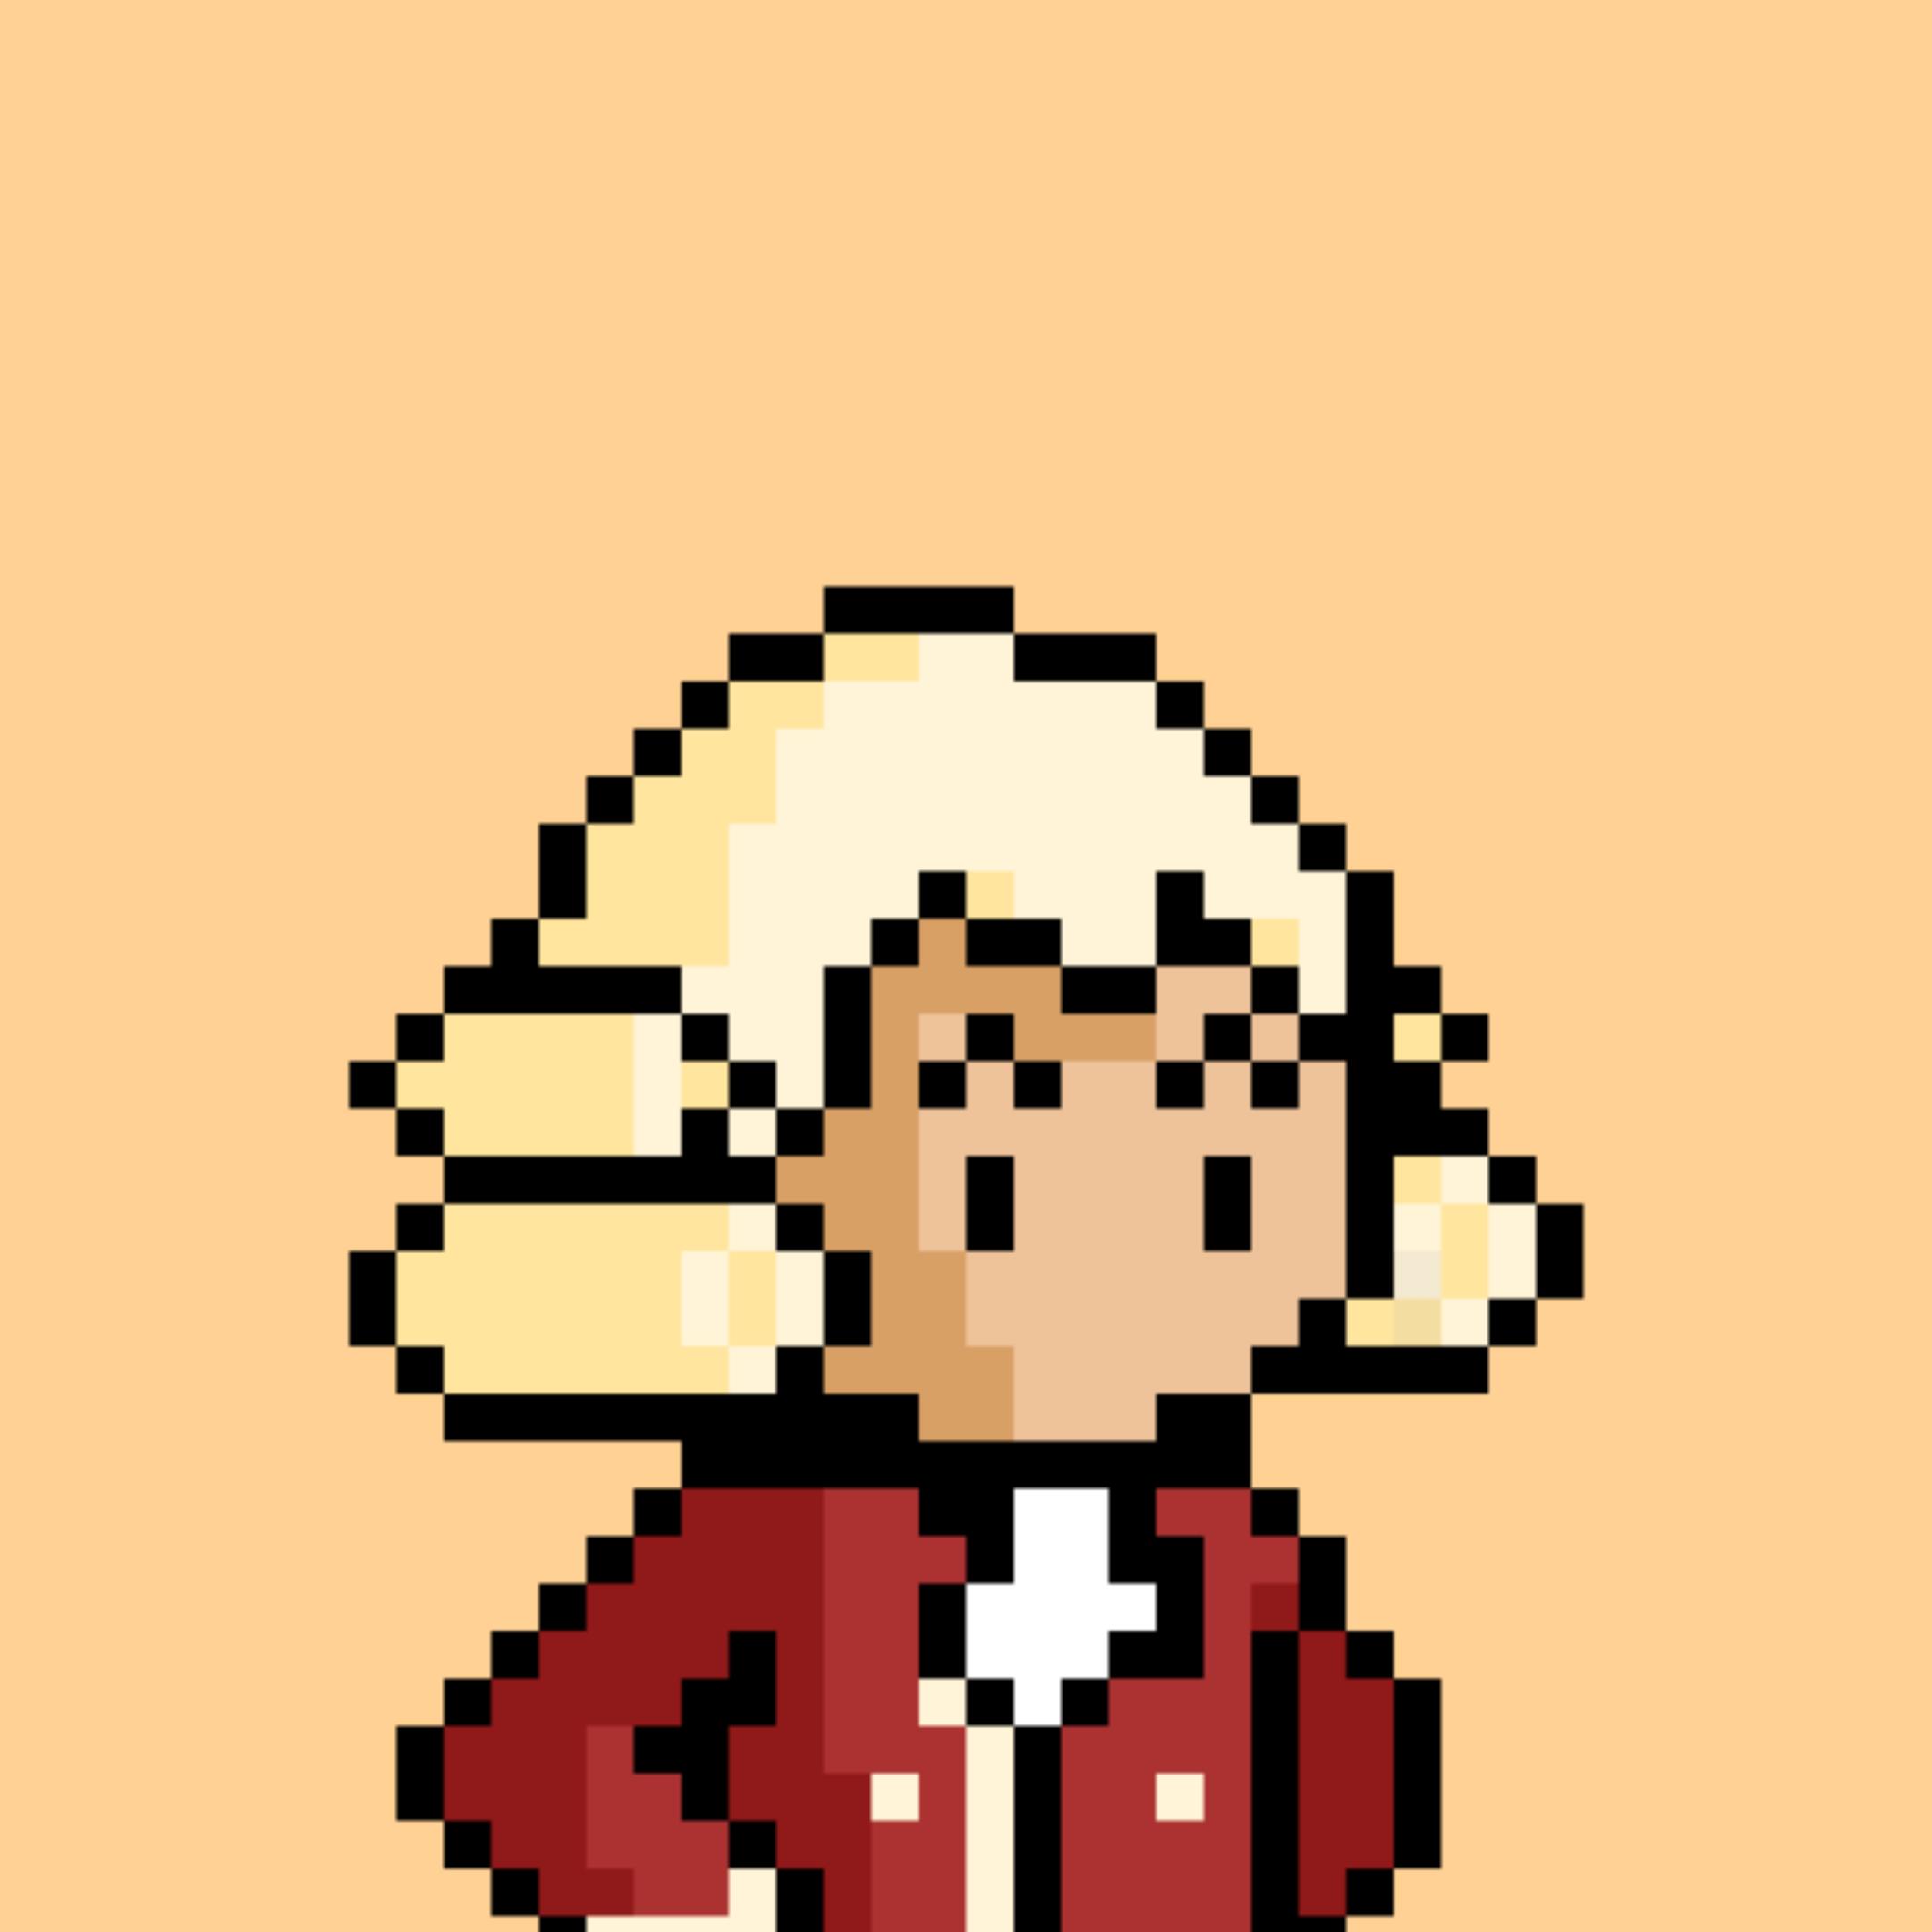 Mozart in pixel format